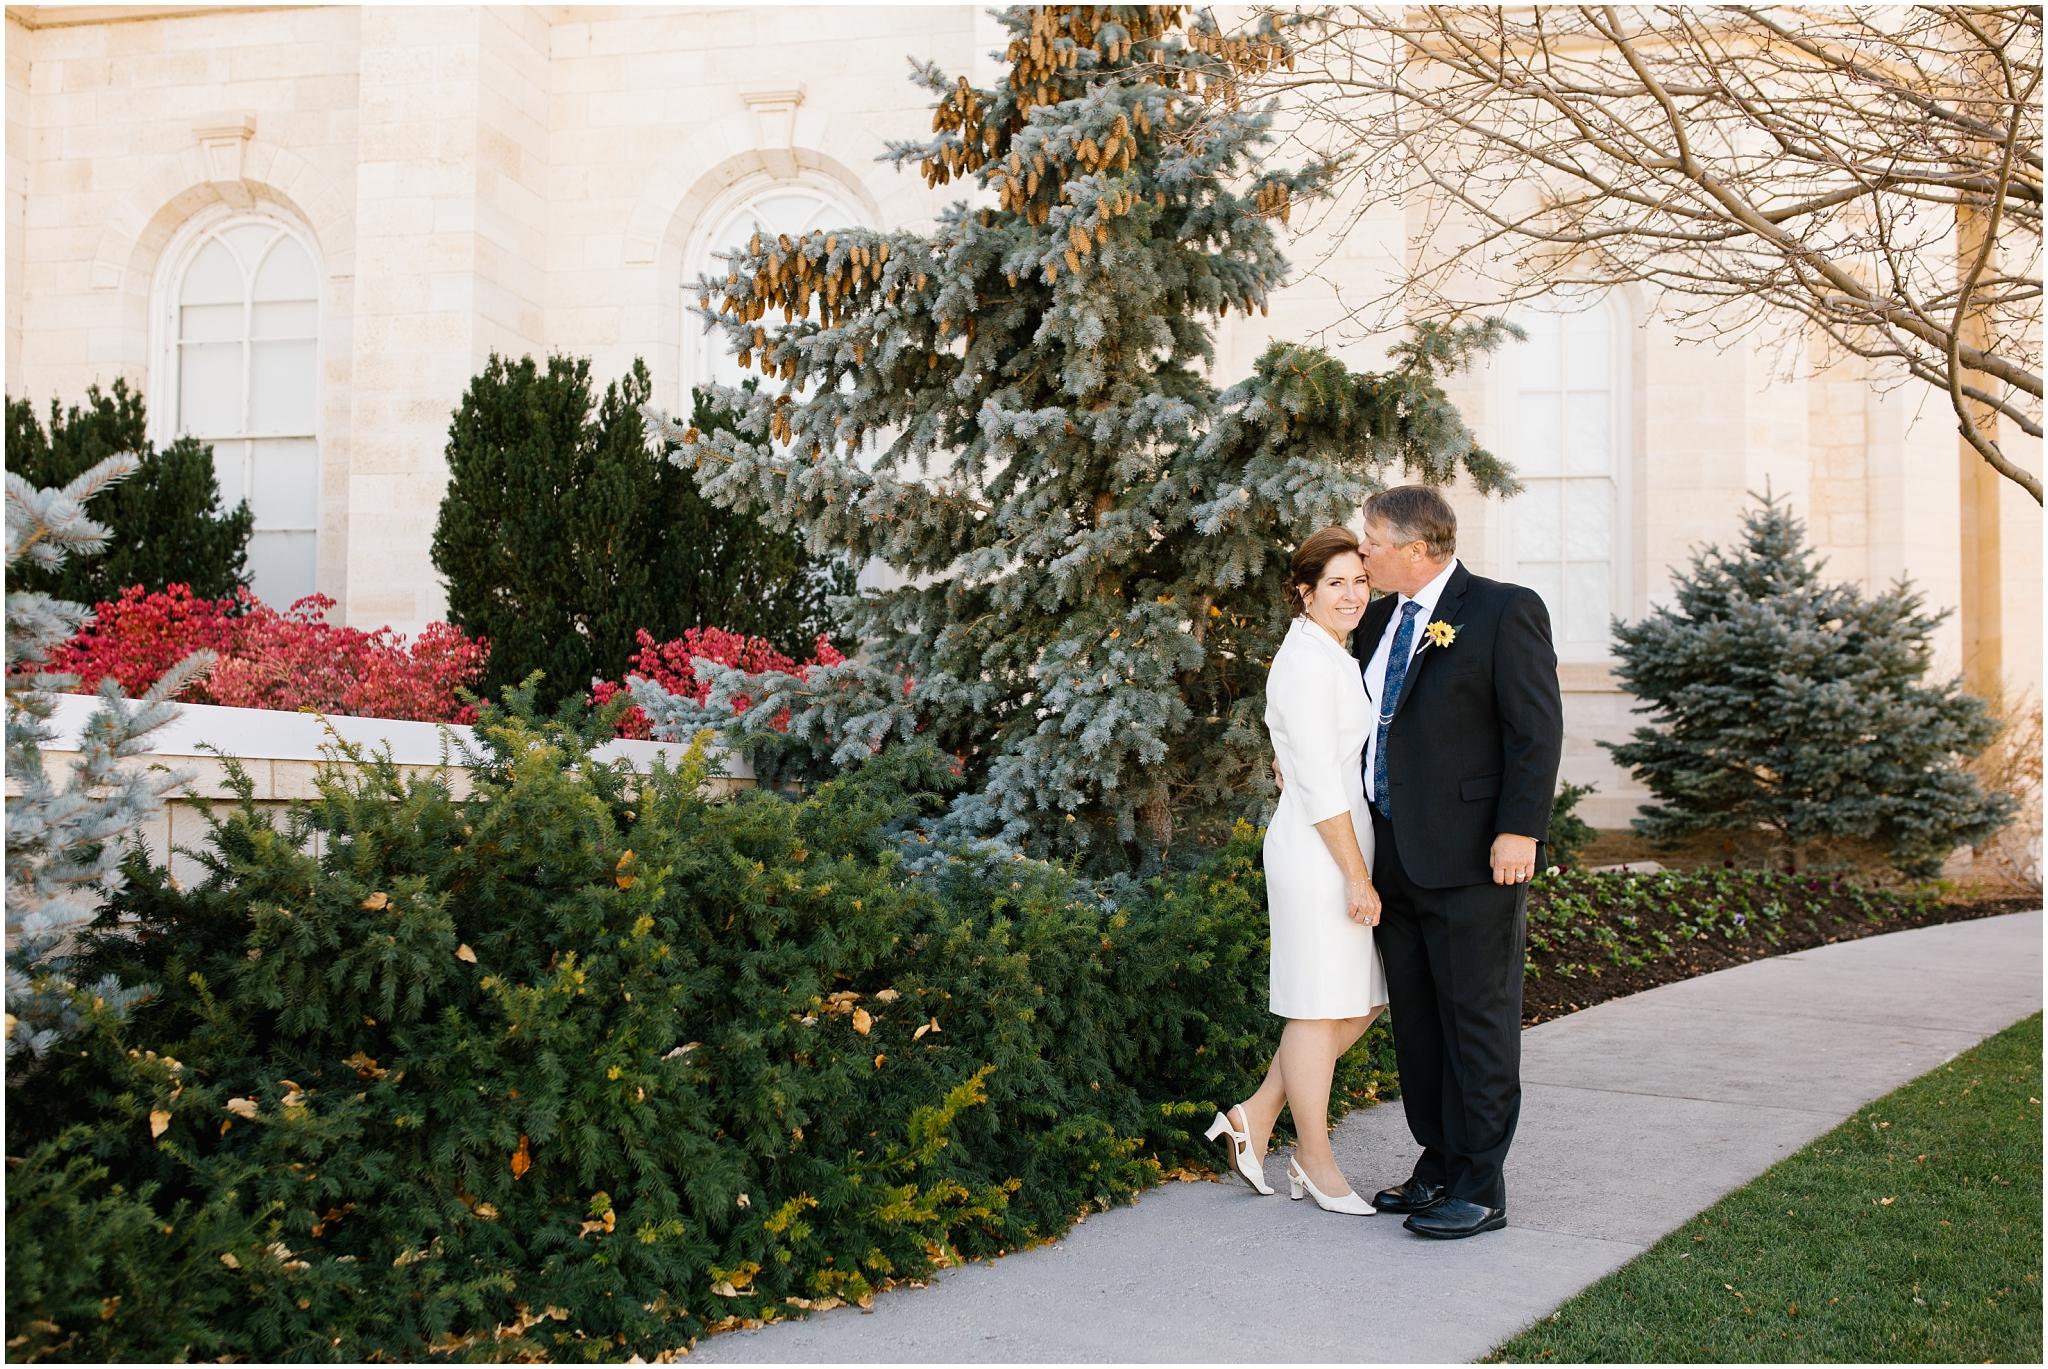 PDWeddingDay-115_Lizzie-B-Imagery-Utah-Wedding-Photographer-Salt-Lake-City-Park-City-Utah-County-Manti-Temple.jpg